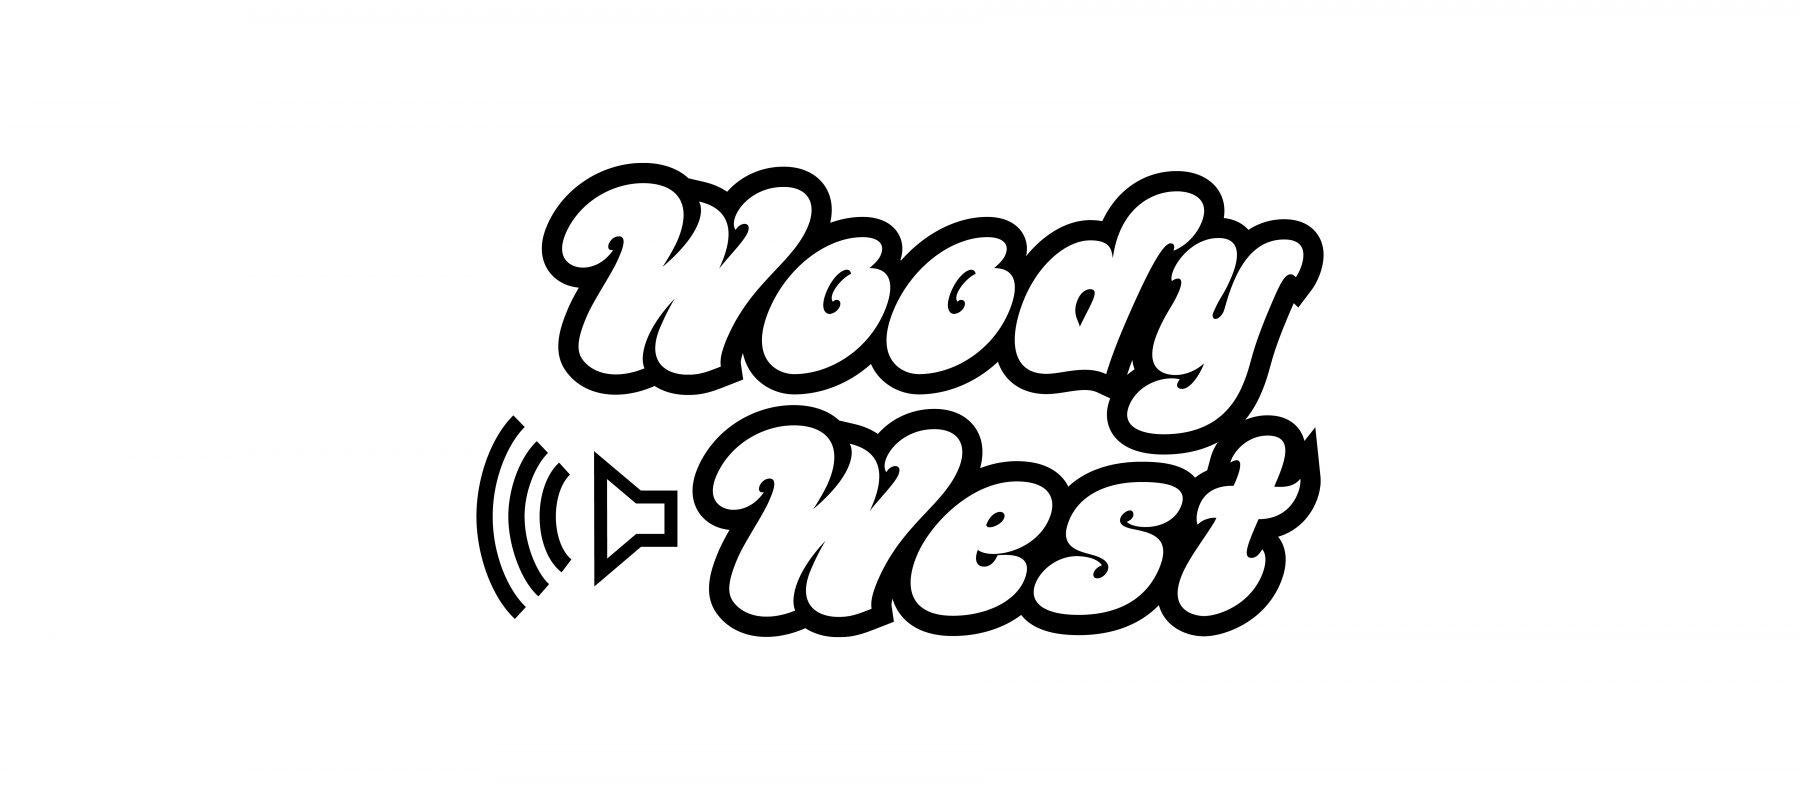 Woody West